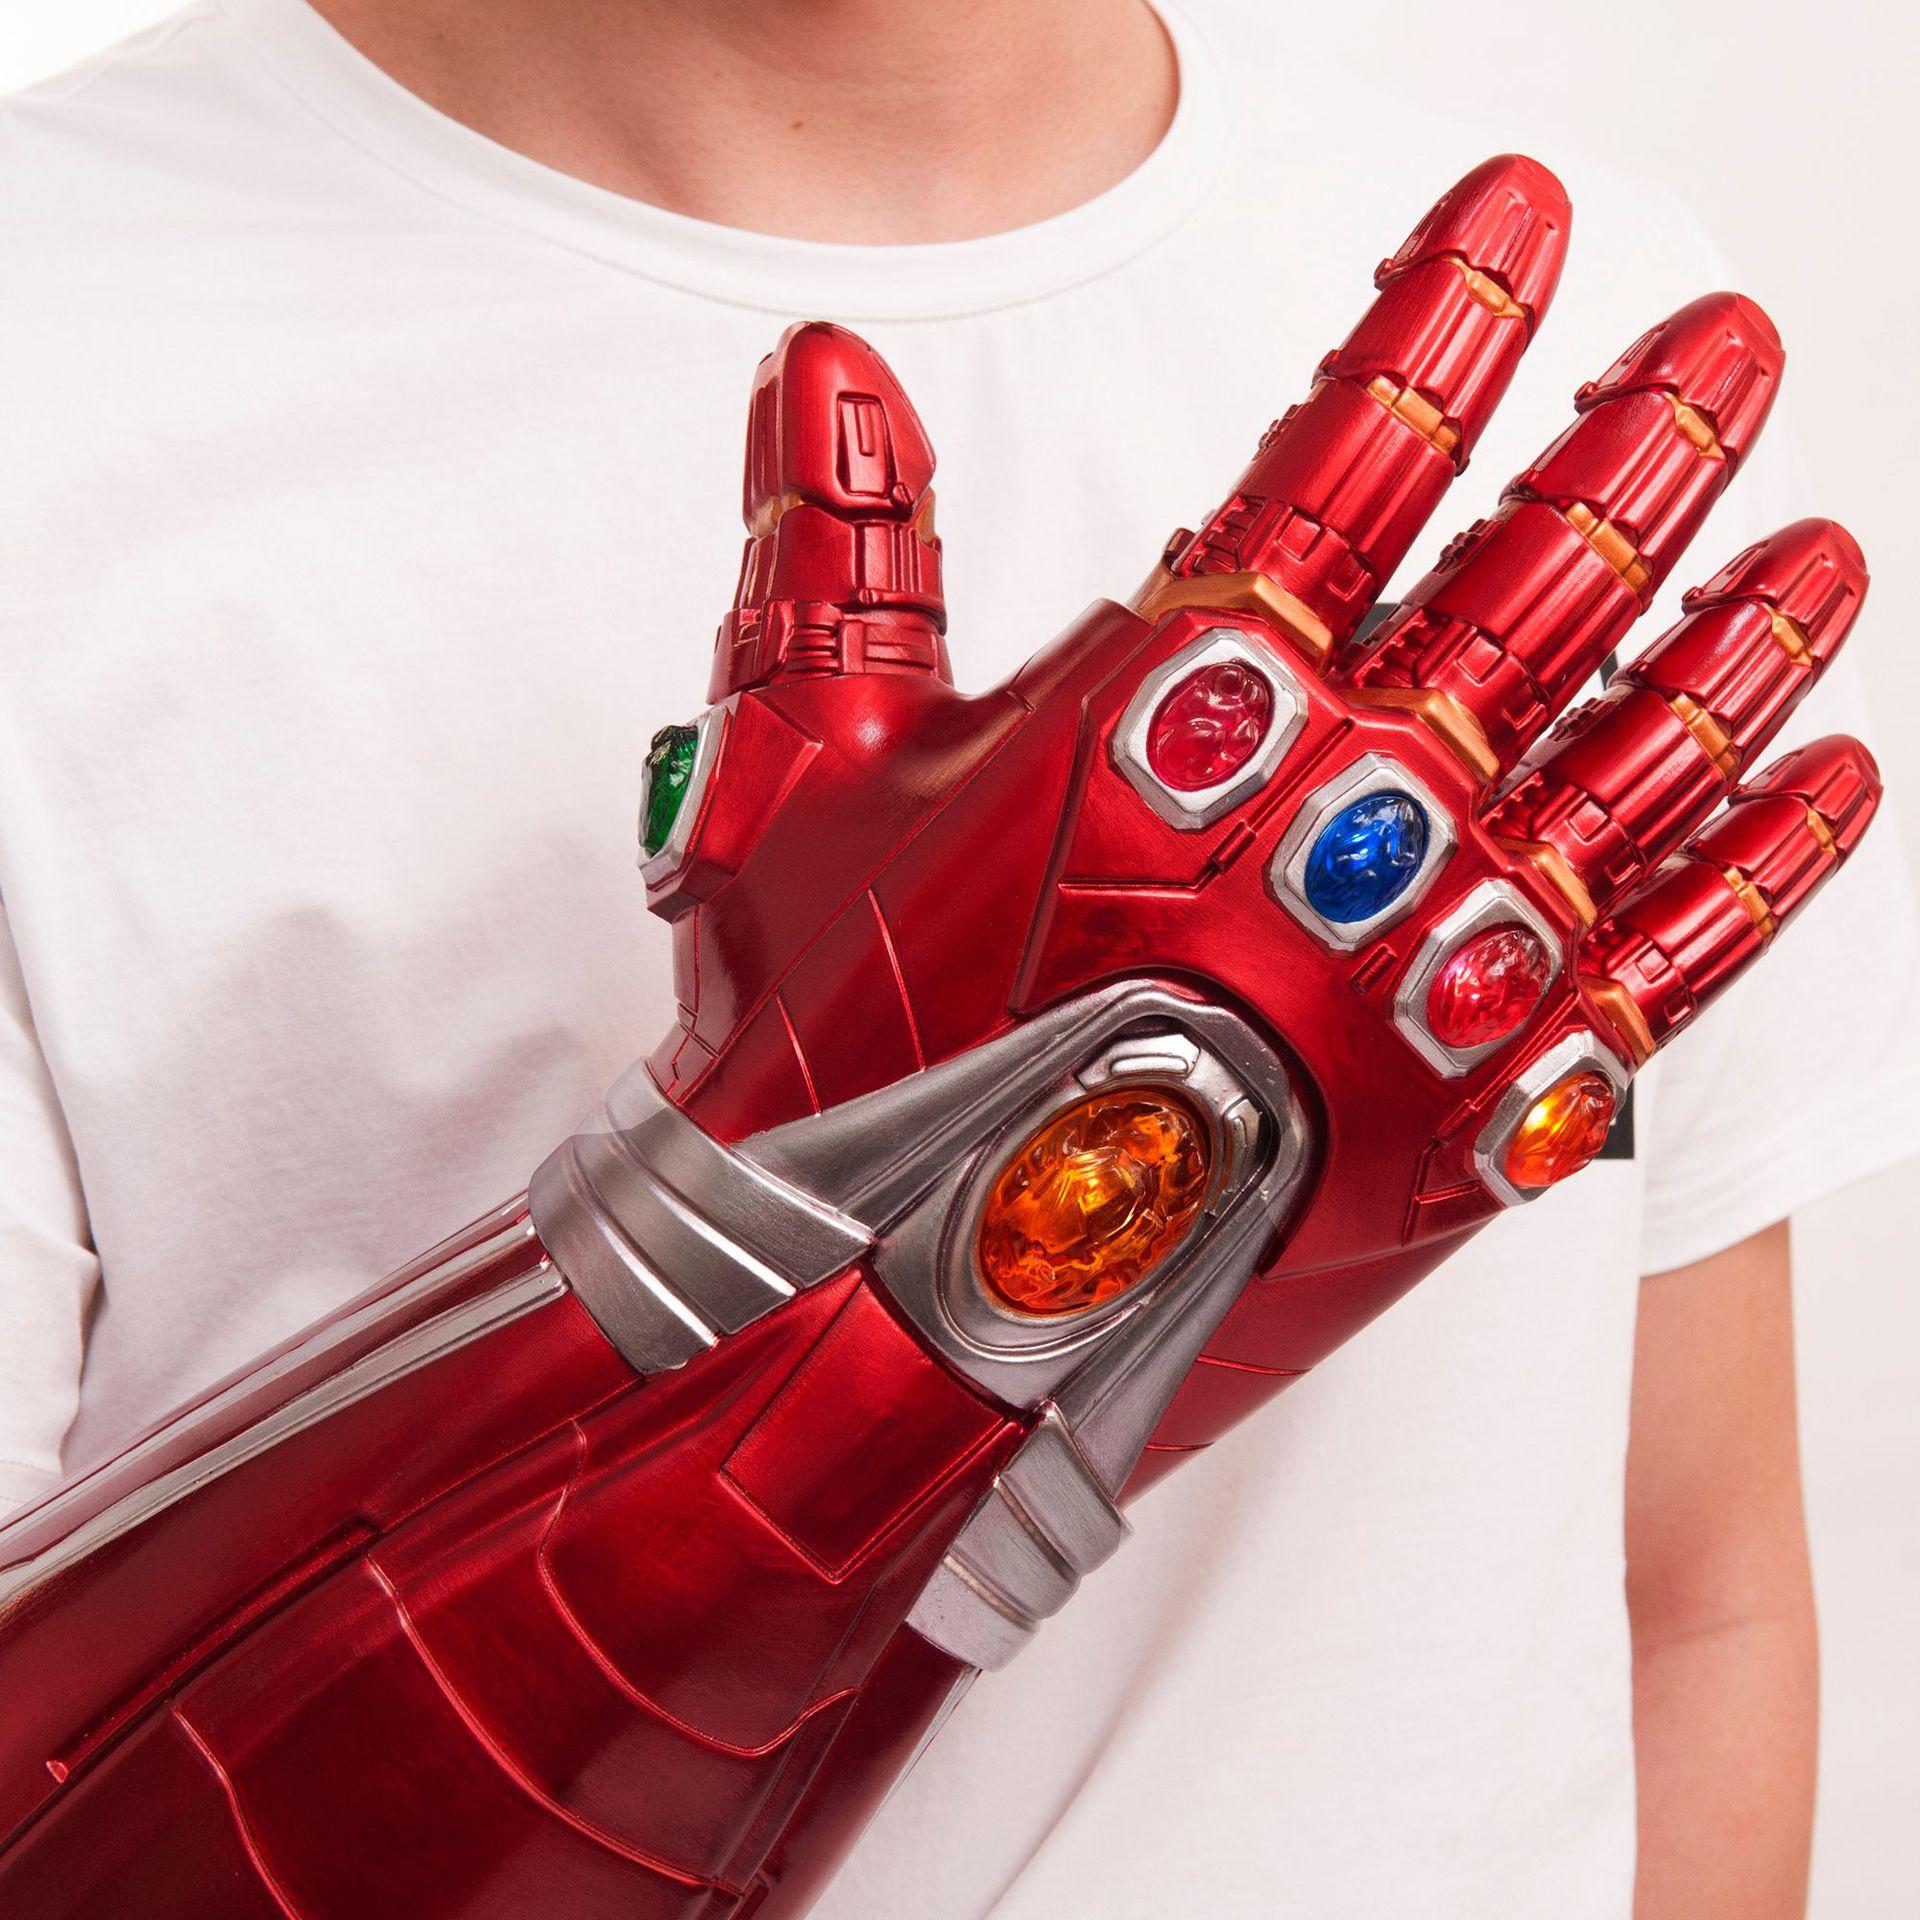 Avengers Endgame Infinity Gauntlet Cosplay Iron Man Tony Stark LED Gloves Props